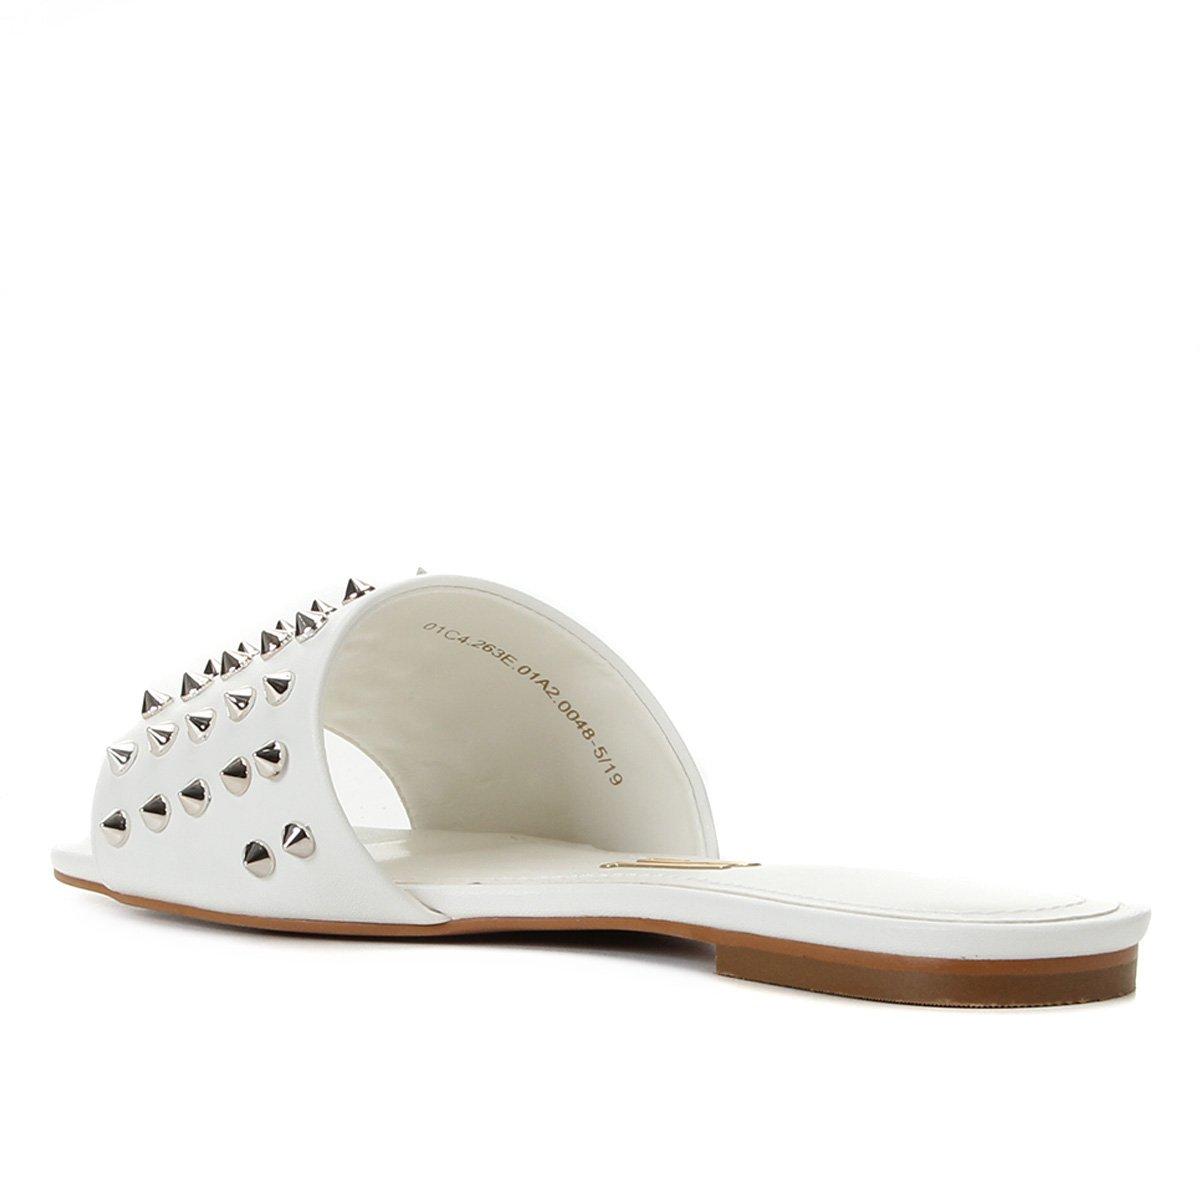 Rasteira Santa Lolla Slide Spikes - Branco